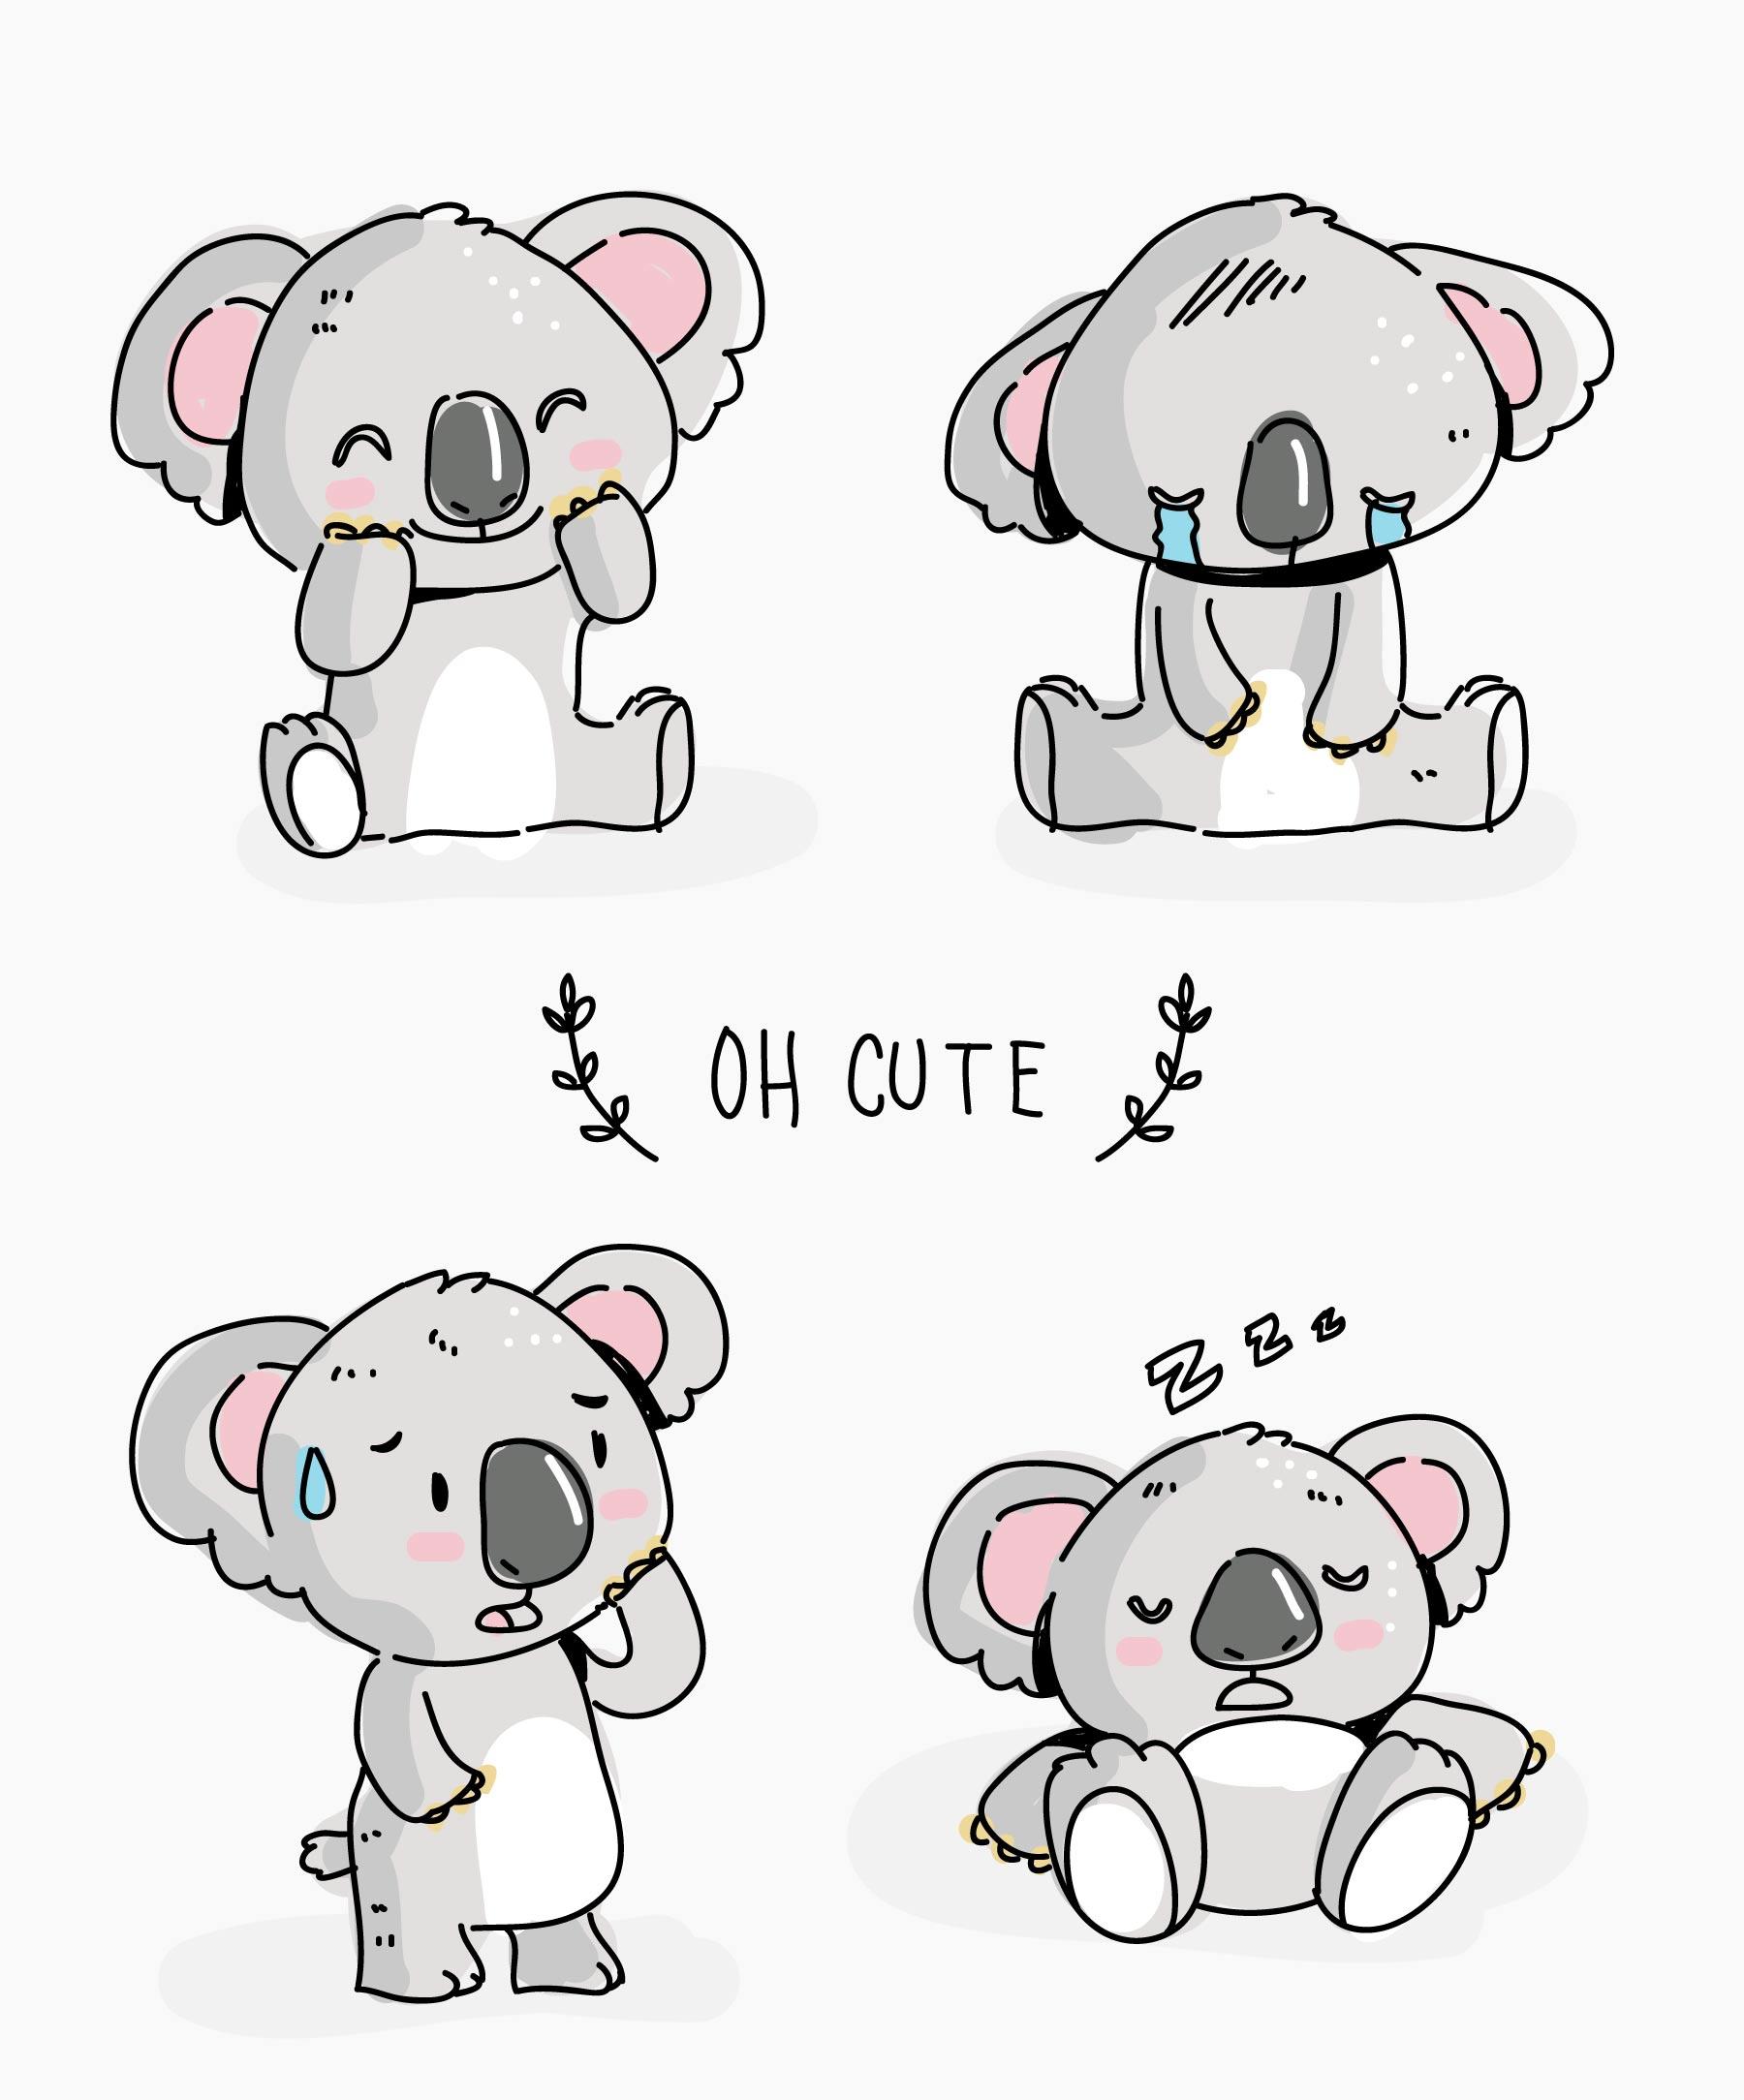 Cute Koala Character Doodle Vector Illustration - Download ...